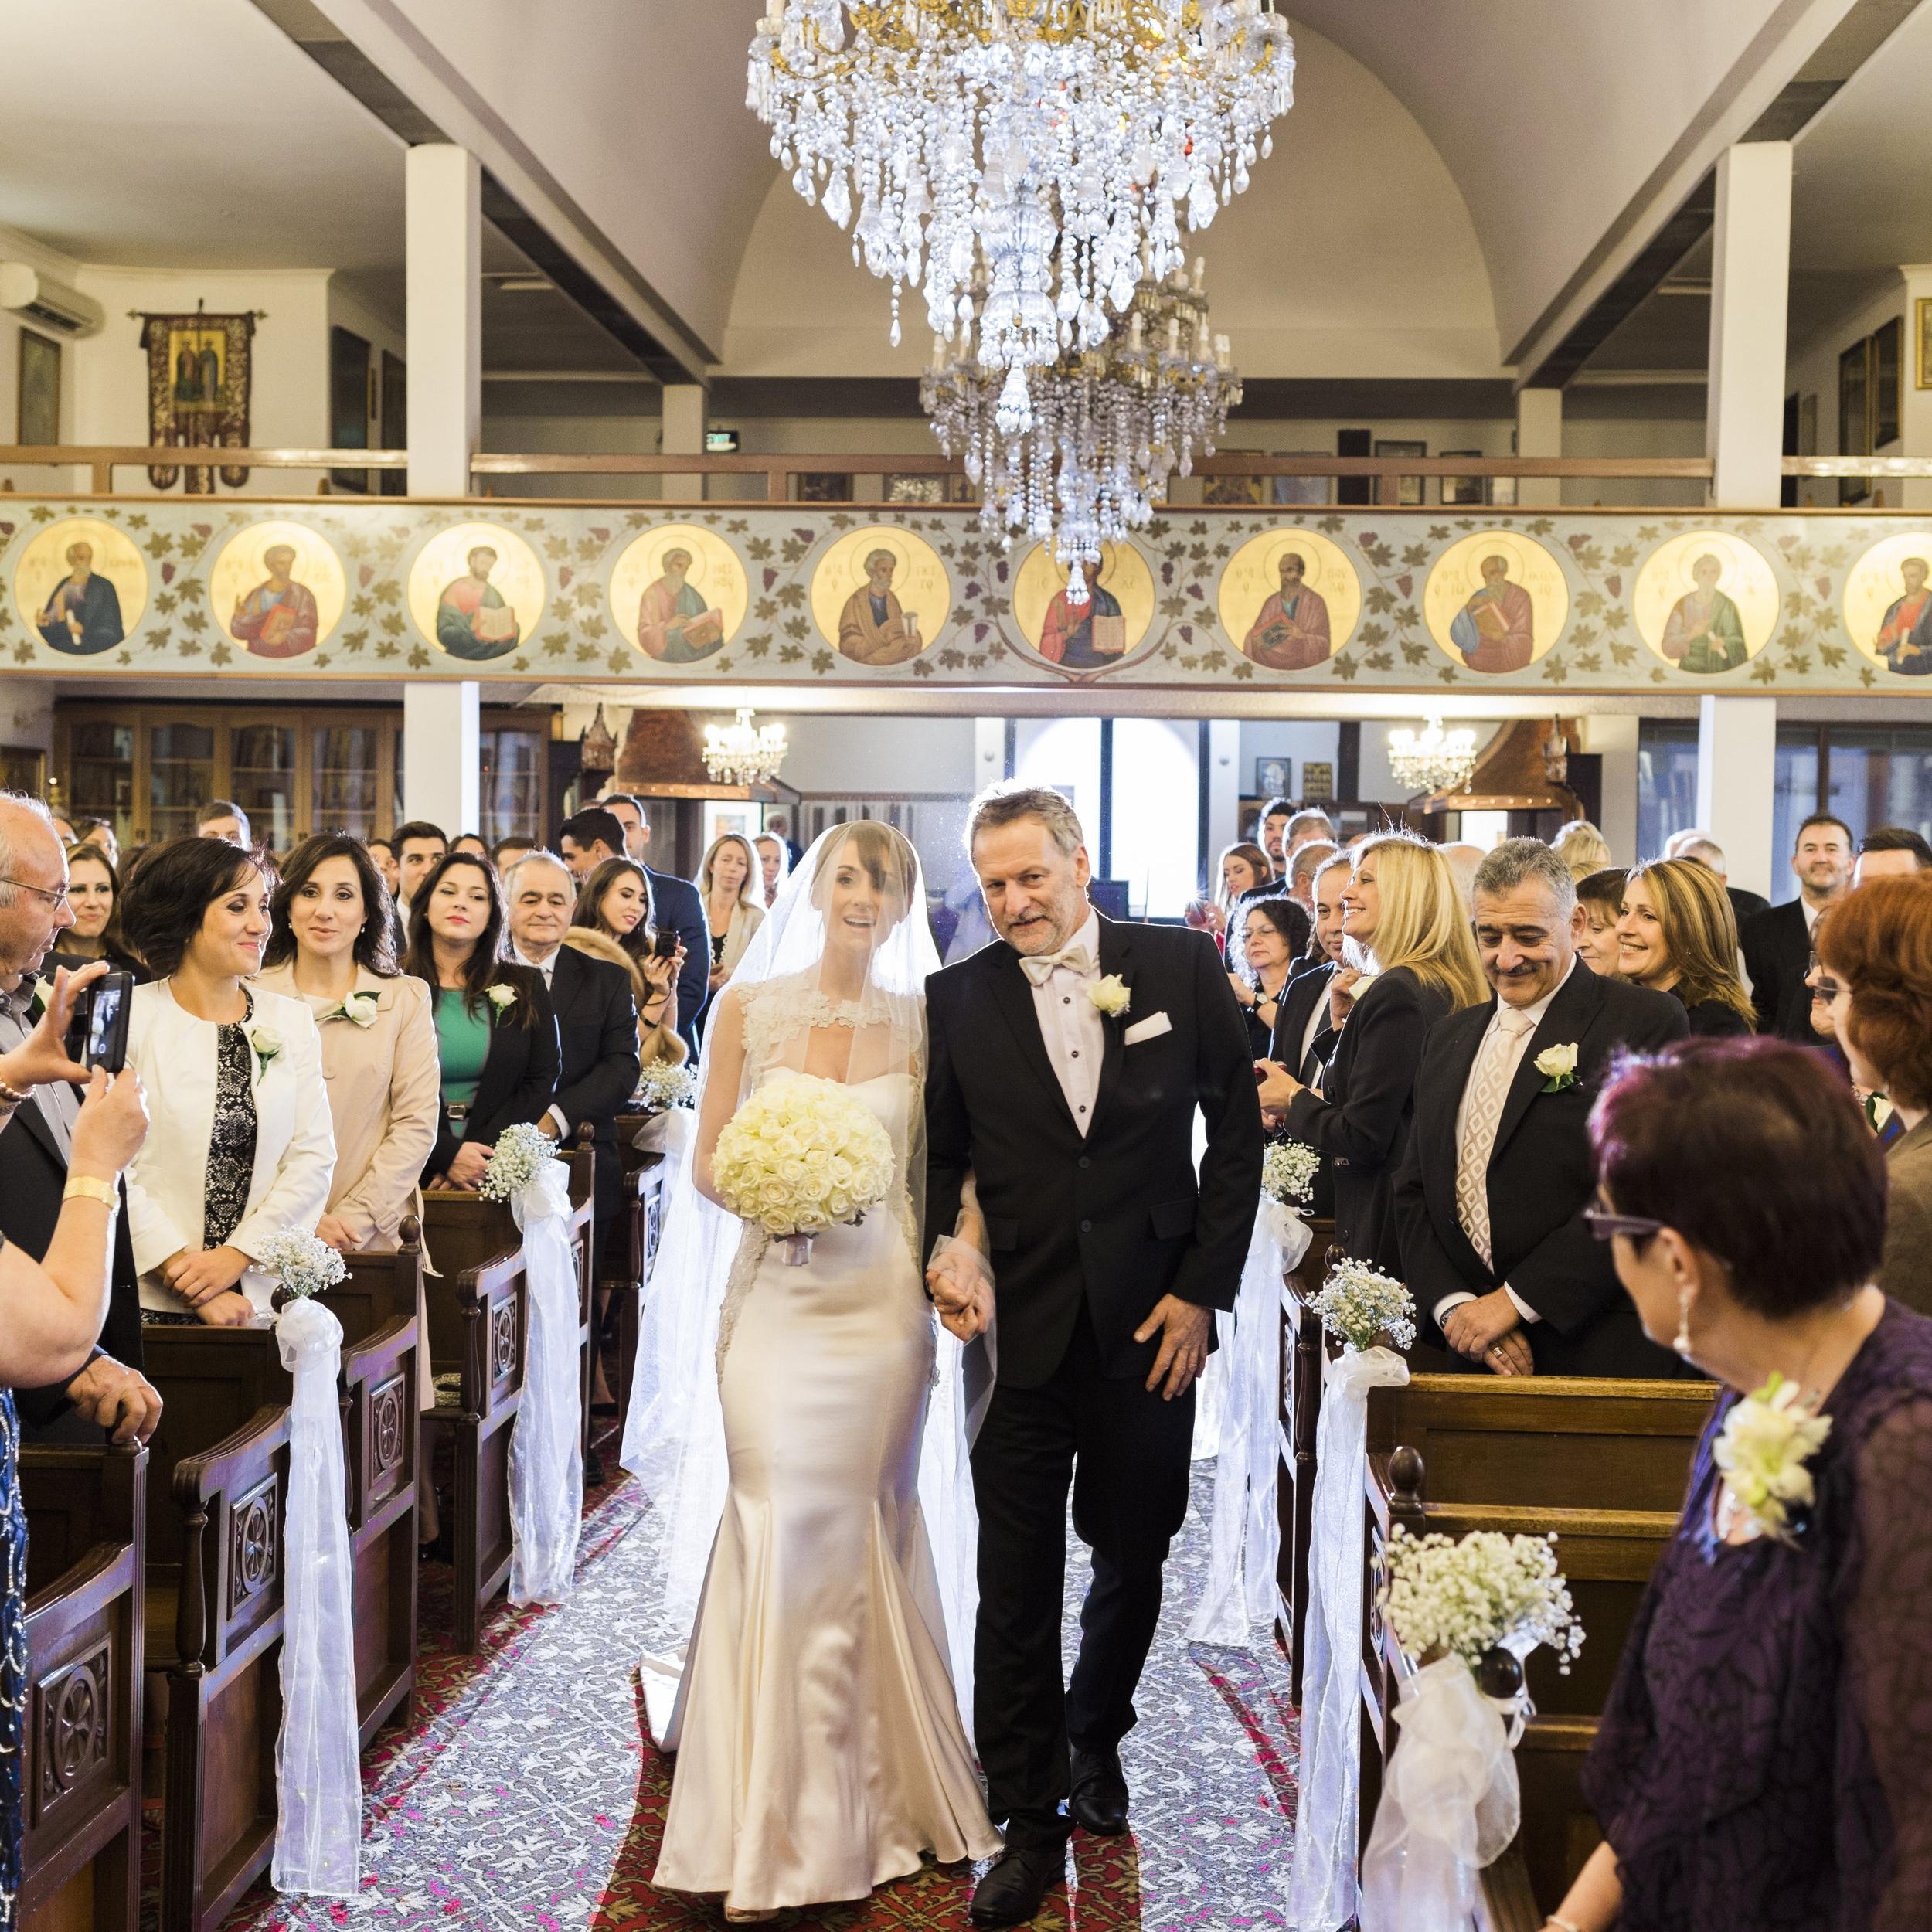 Real Greek Weddings: The True Cost Of A Wedding